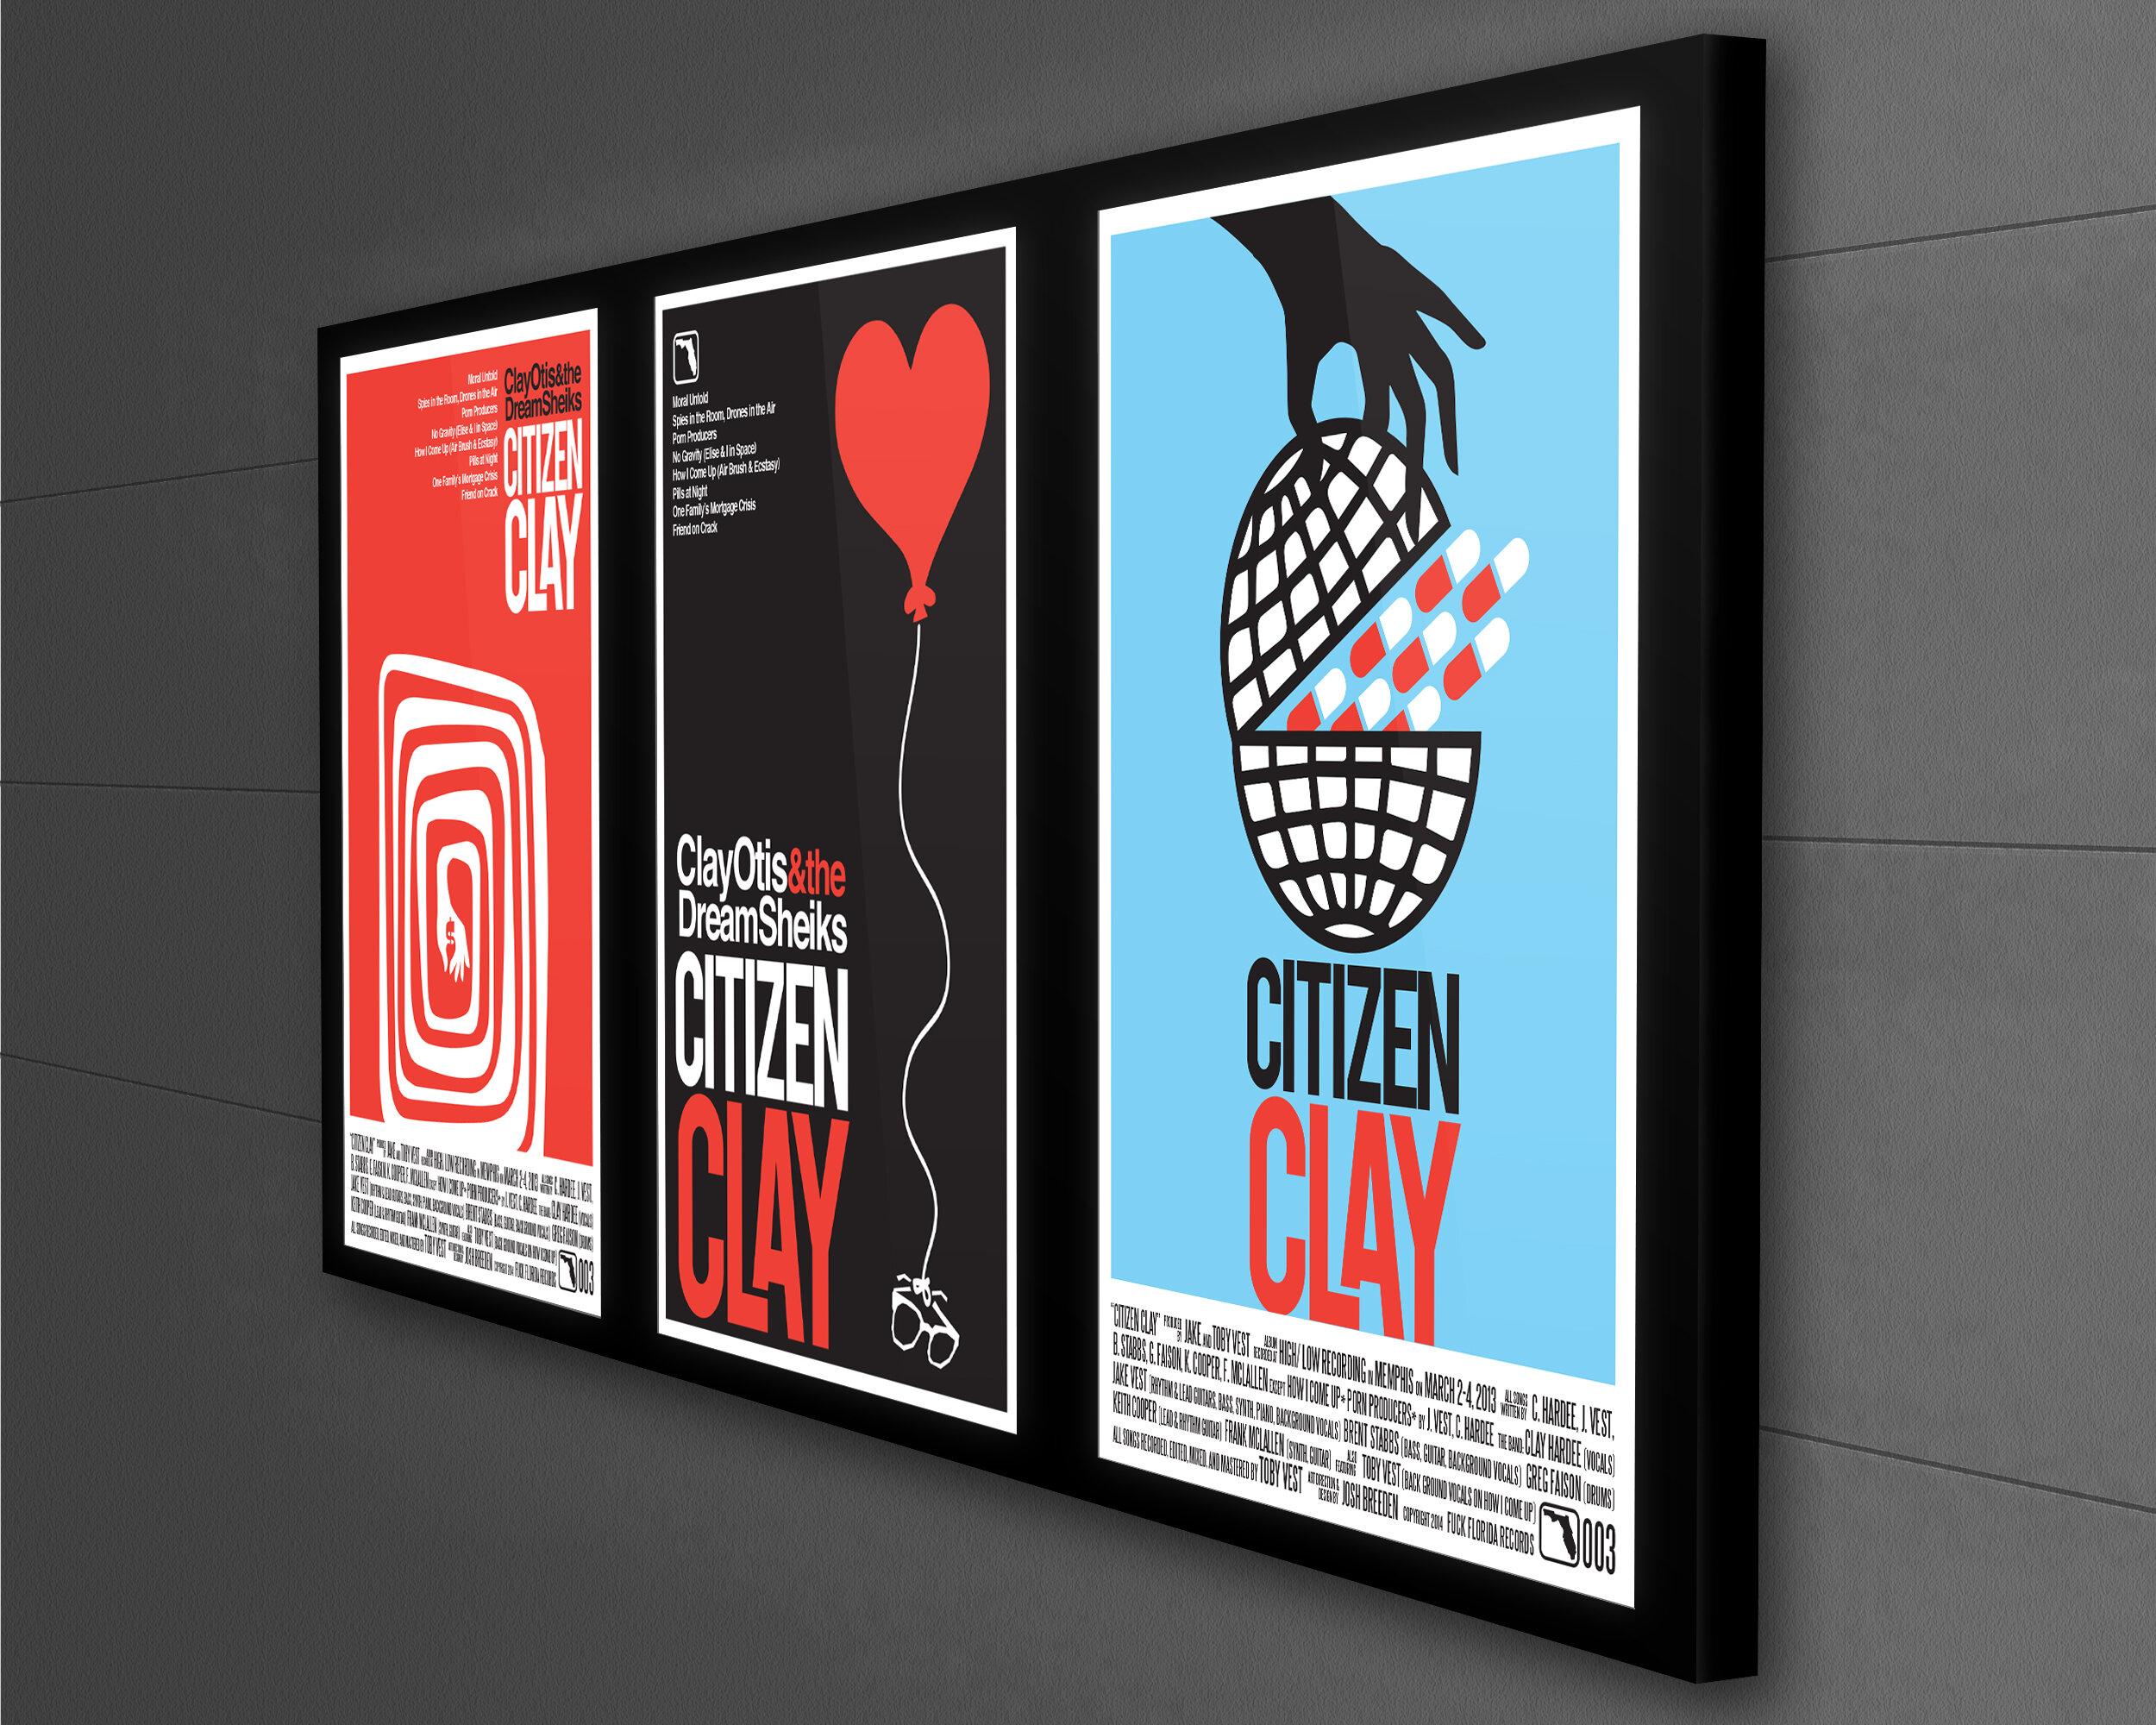 Citizen-Clay-Lightbox-Poster-set.jpg